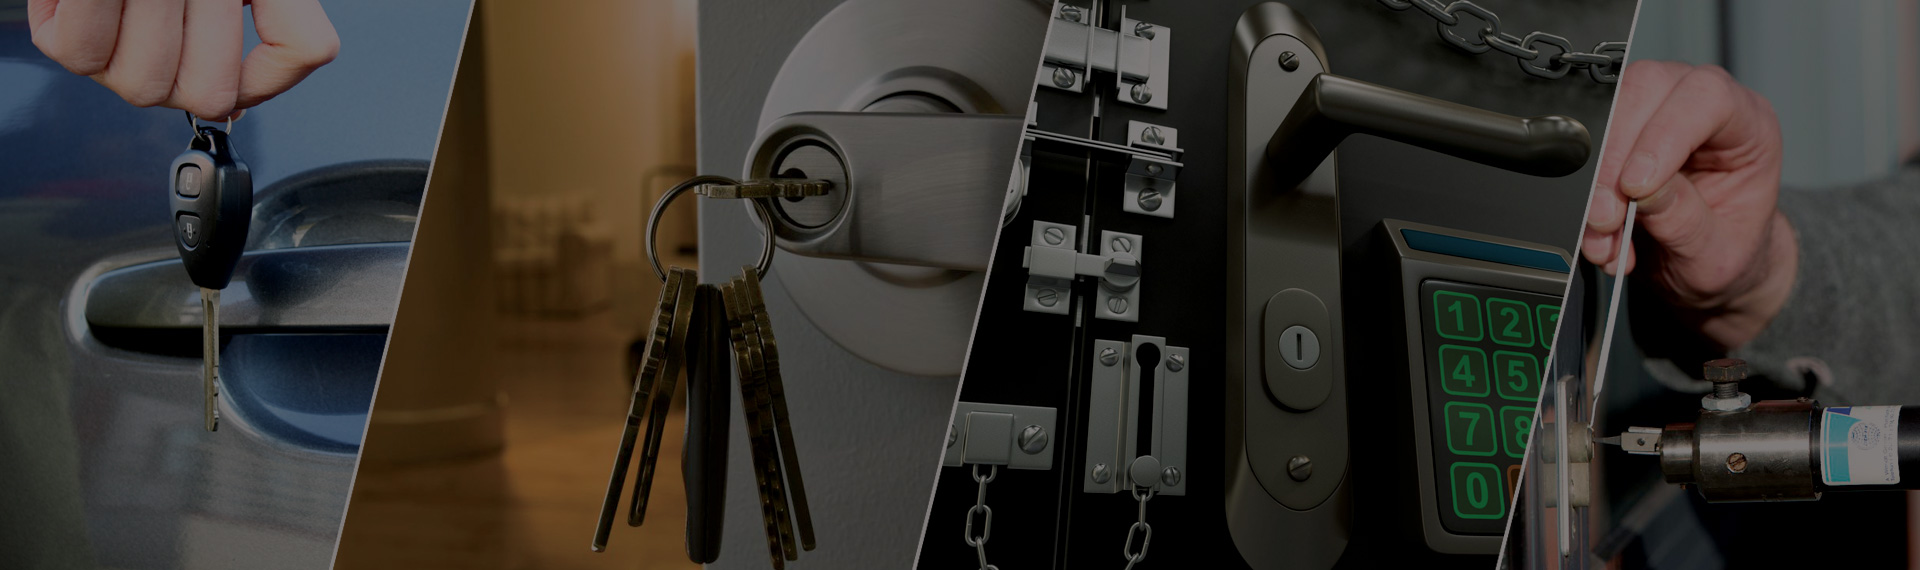 A 24 Hours Emergency Locksmith Mount Vernon NY